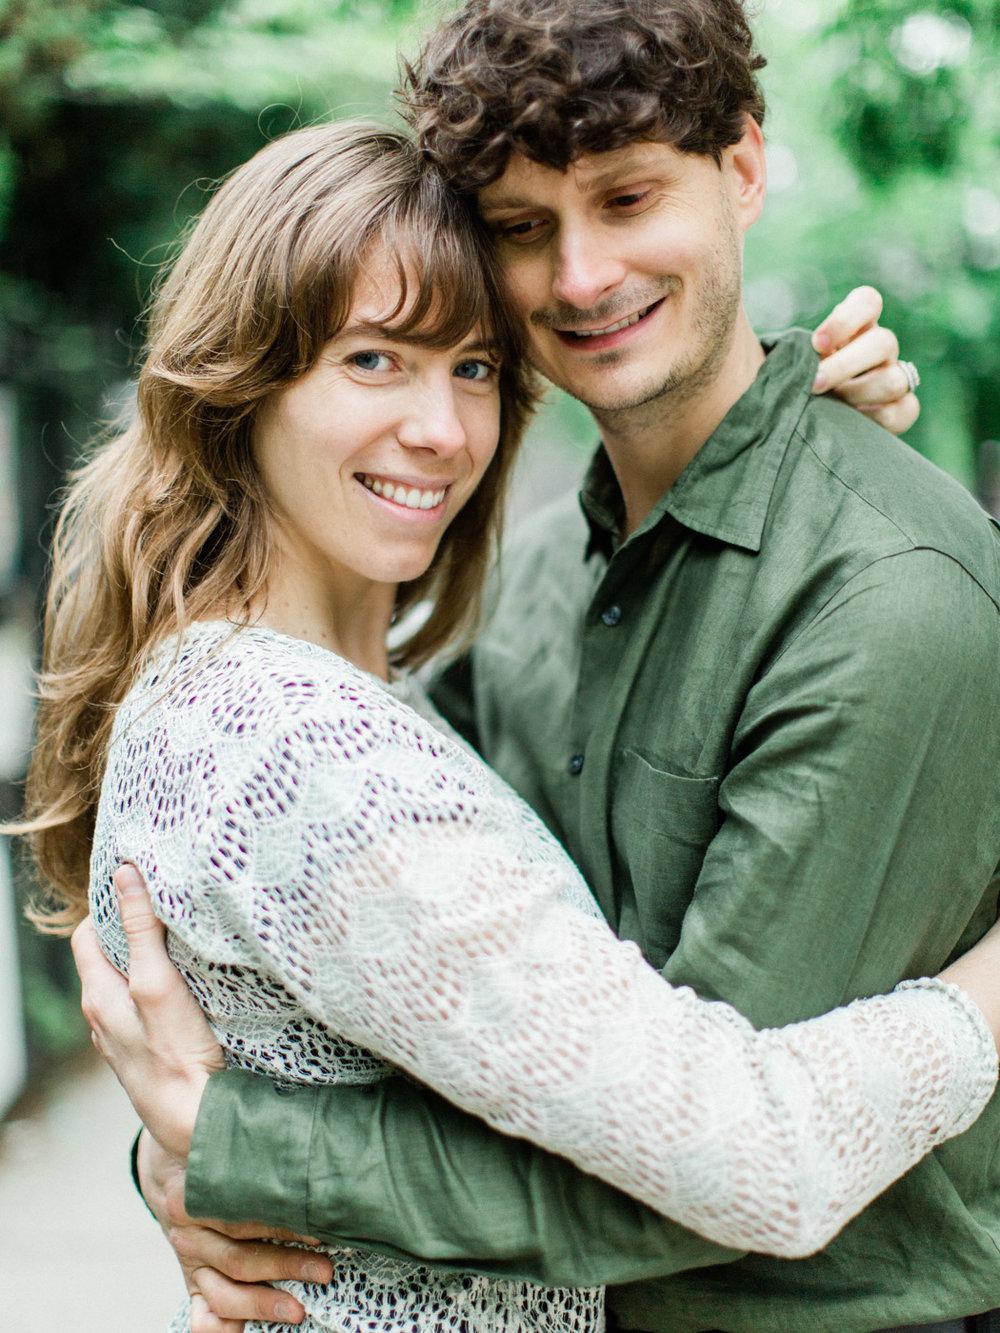 toronto-wedding-photographer-fine-art-documentary-new-york-east-end-engagement-23.jpg